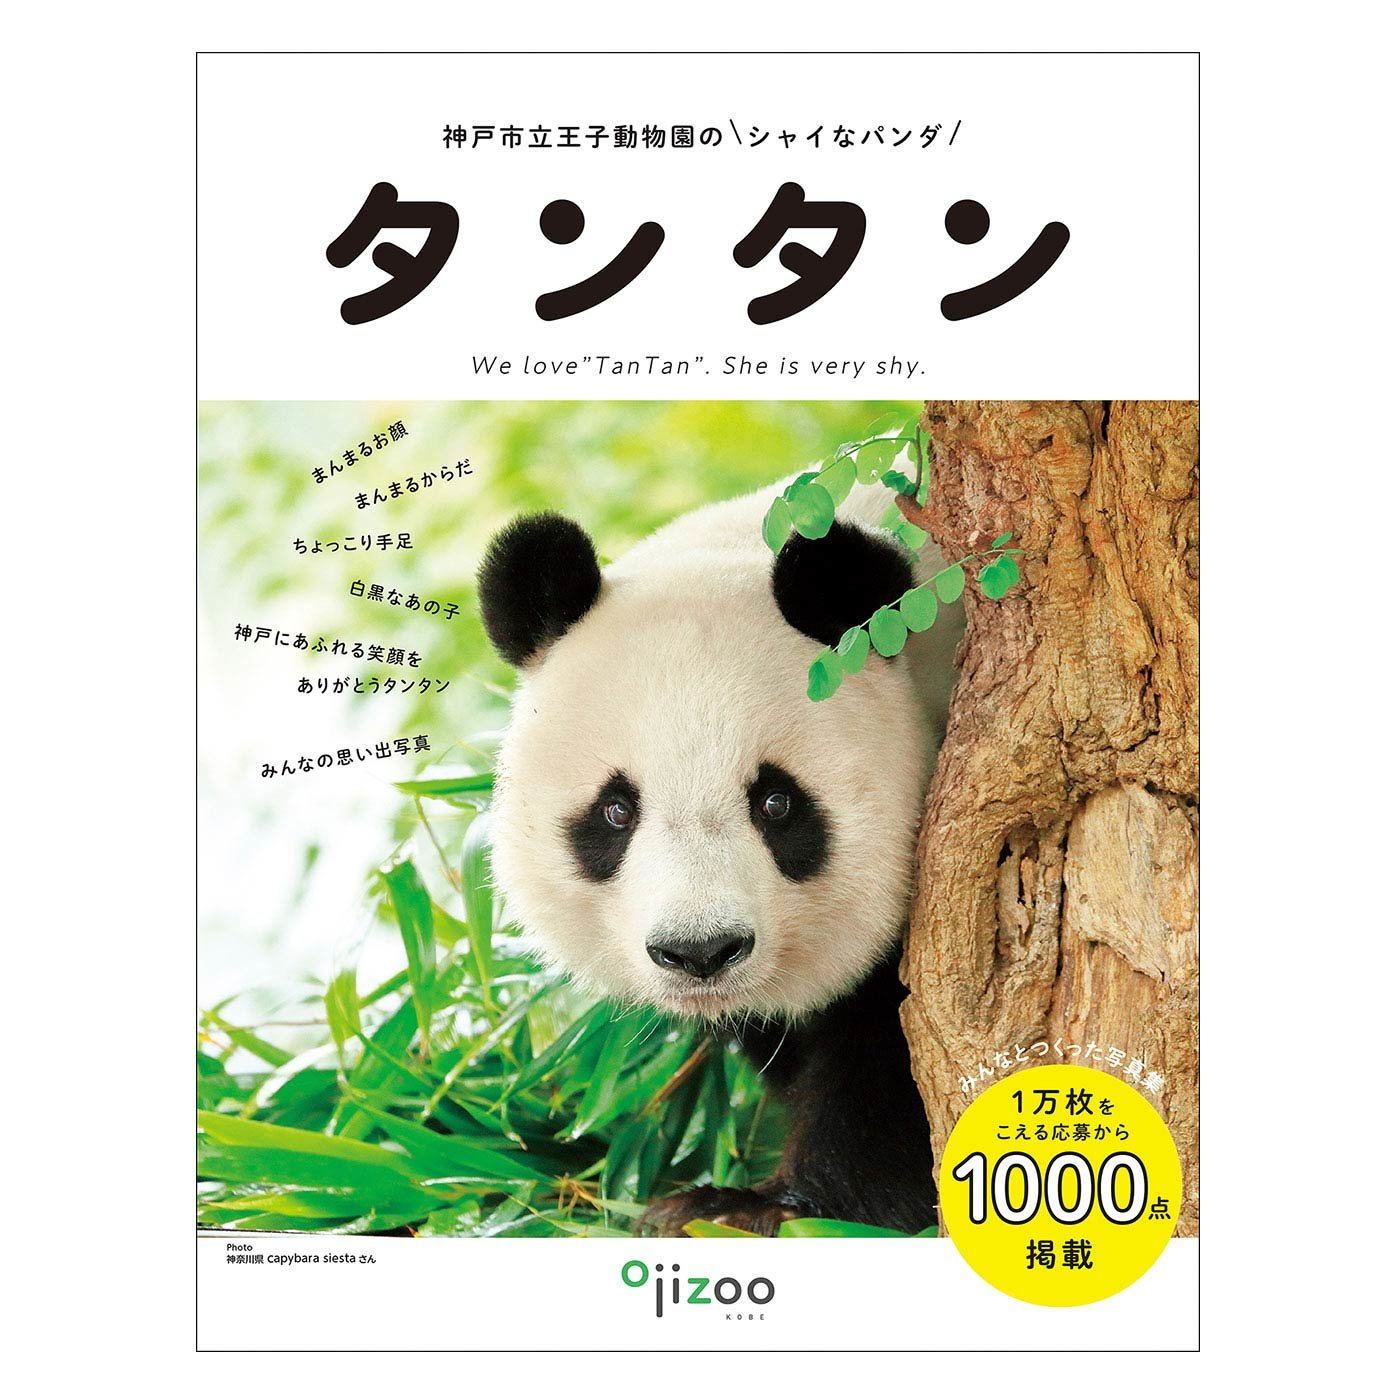 YOU+MORE! 写真集『神戸市立王子動物園のシャイなパンダ タンタン』